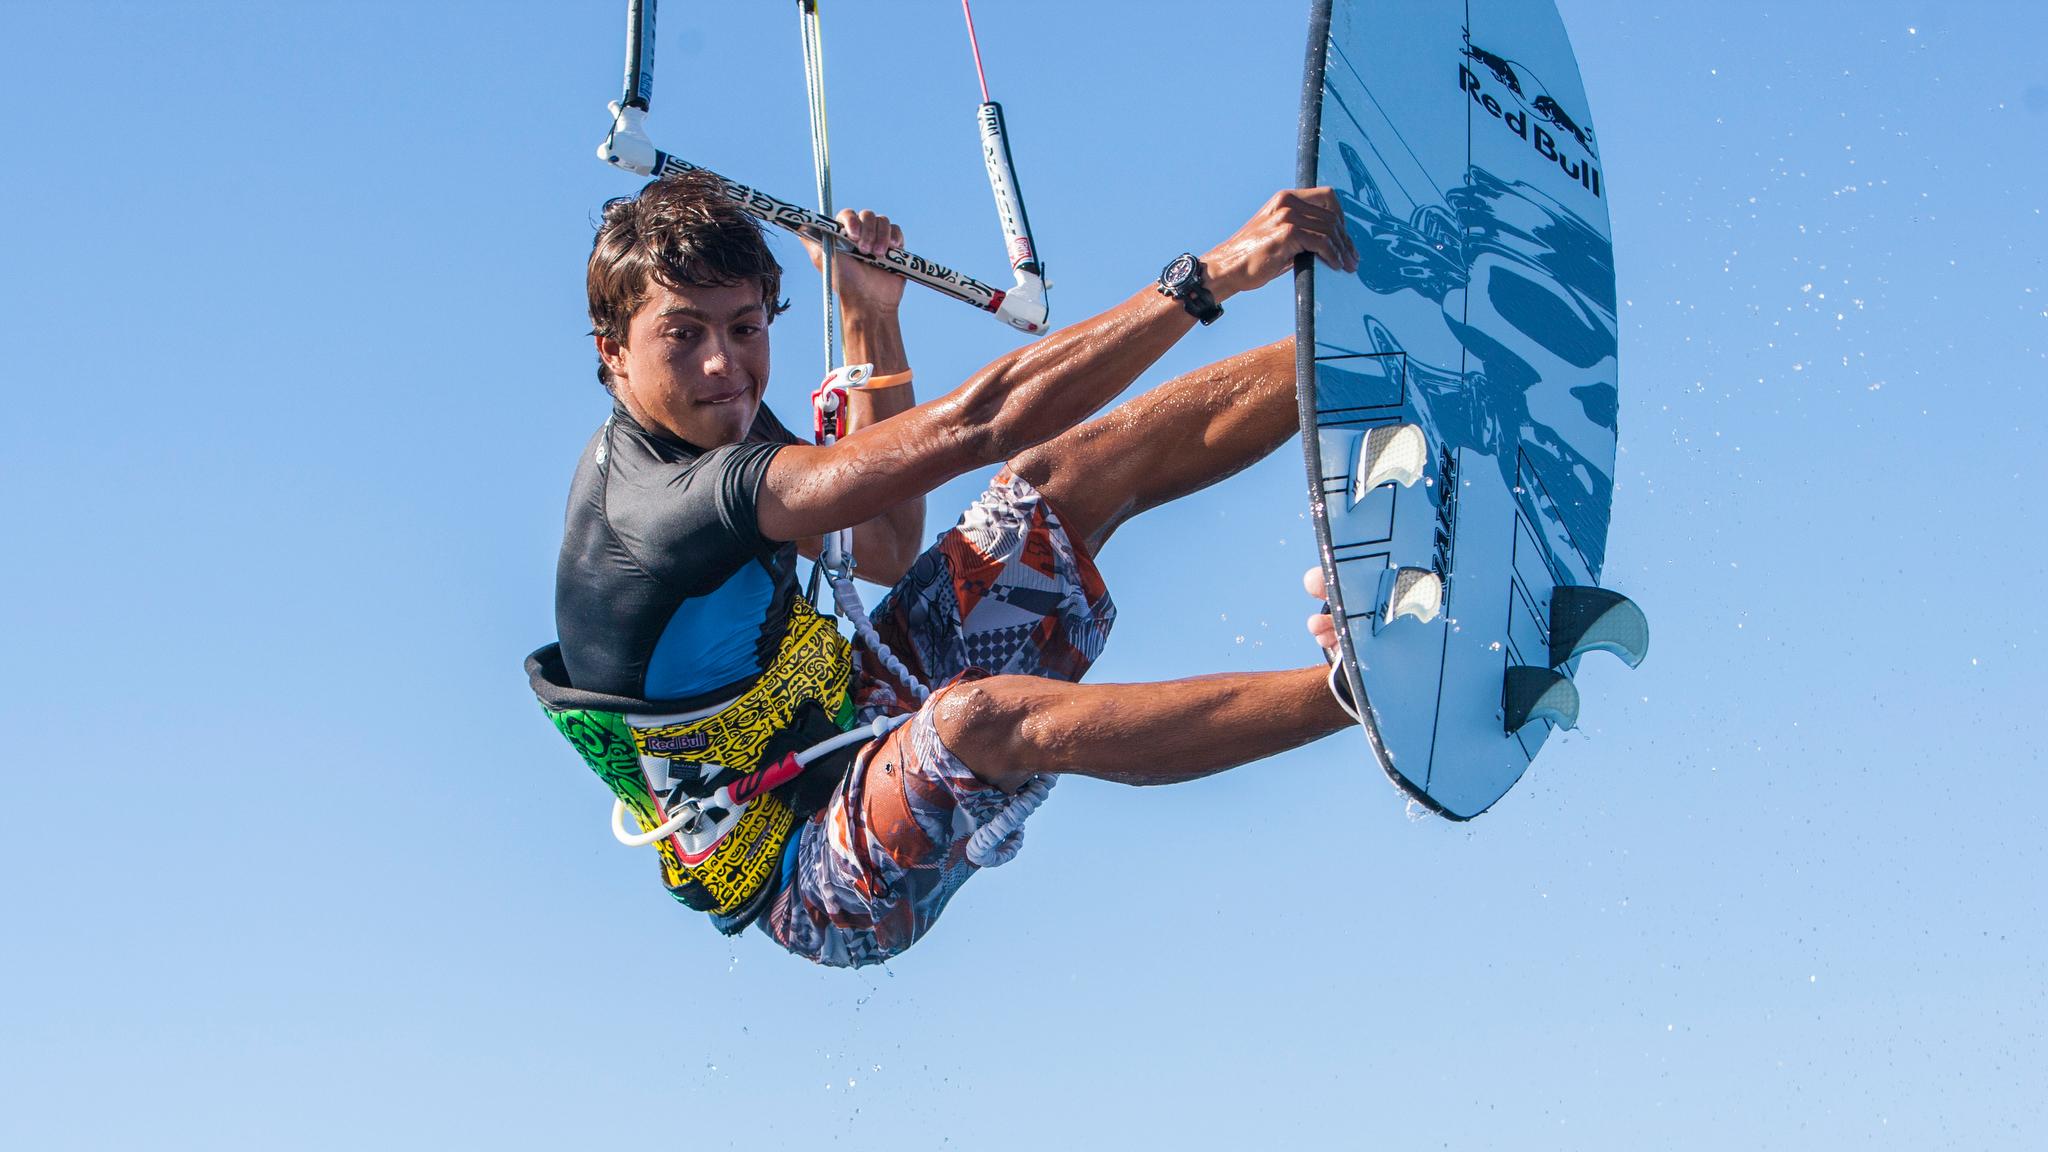 Kite It Up